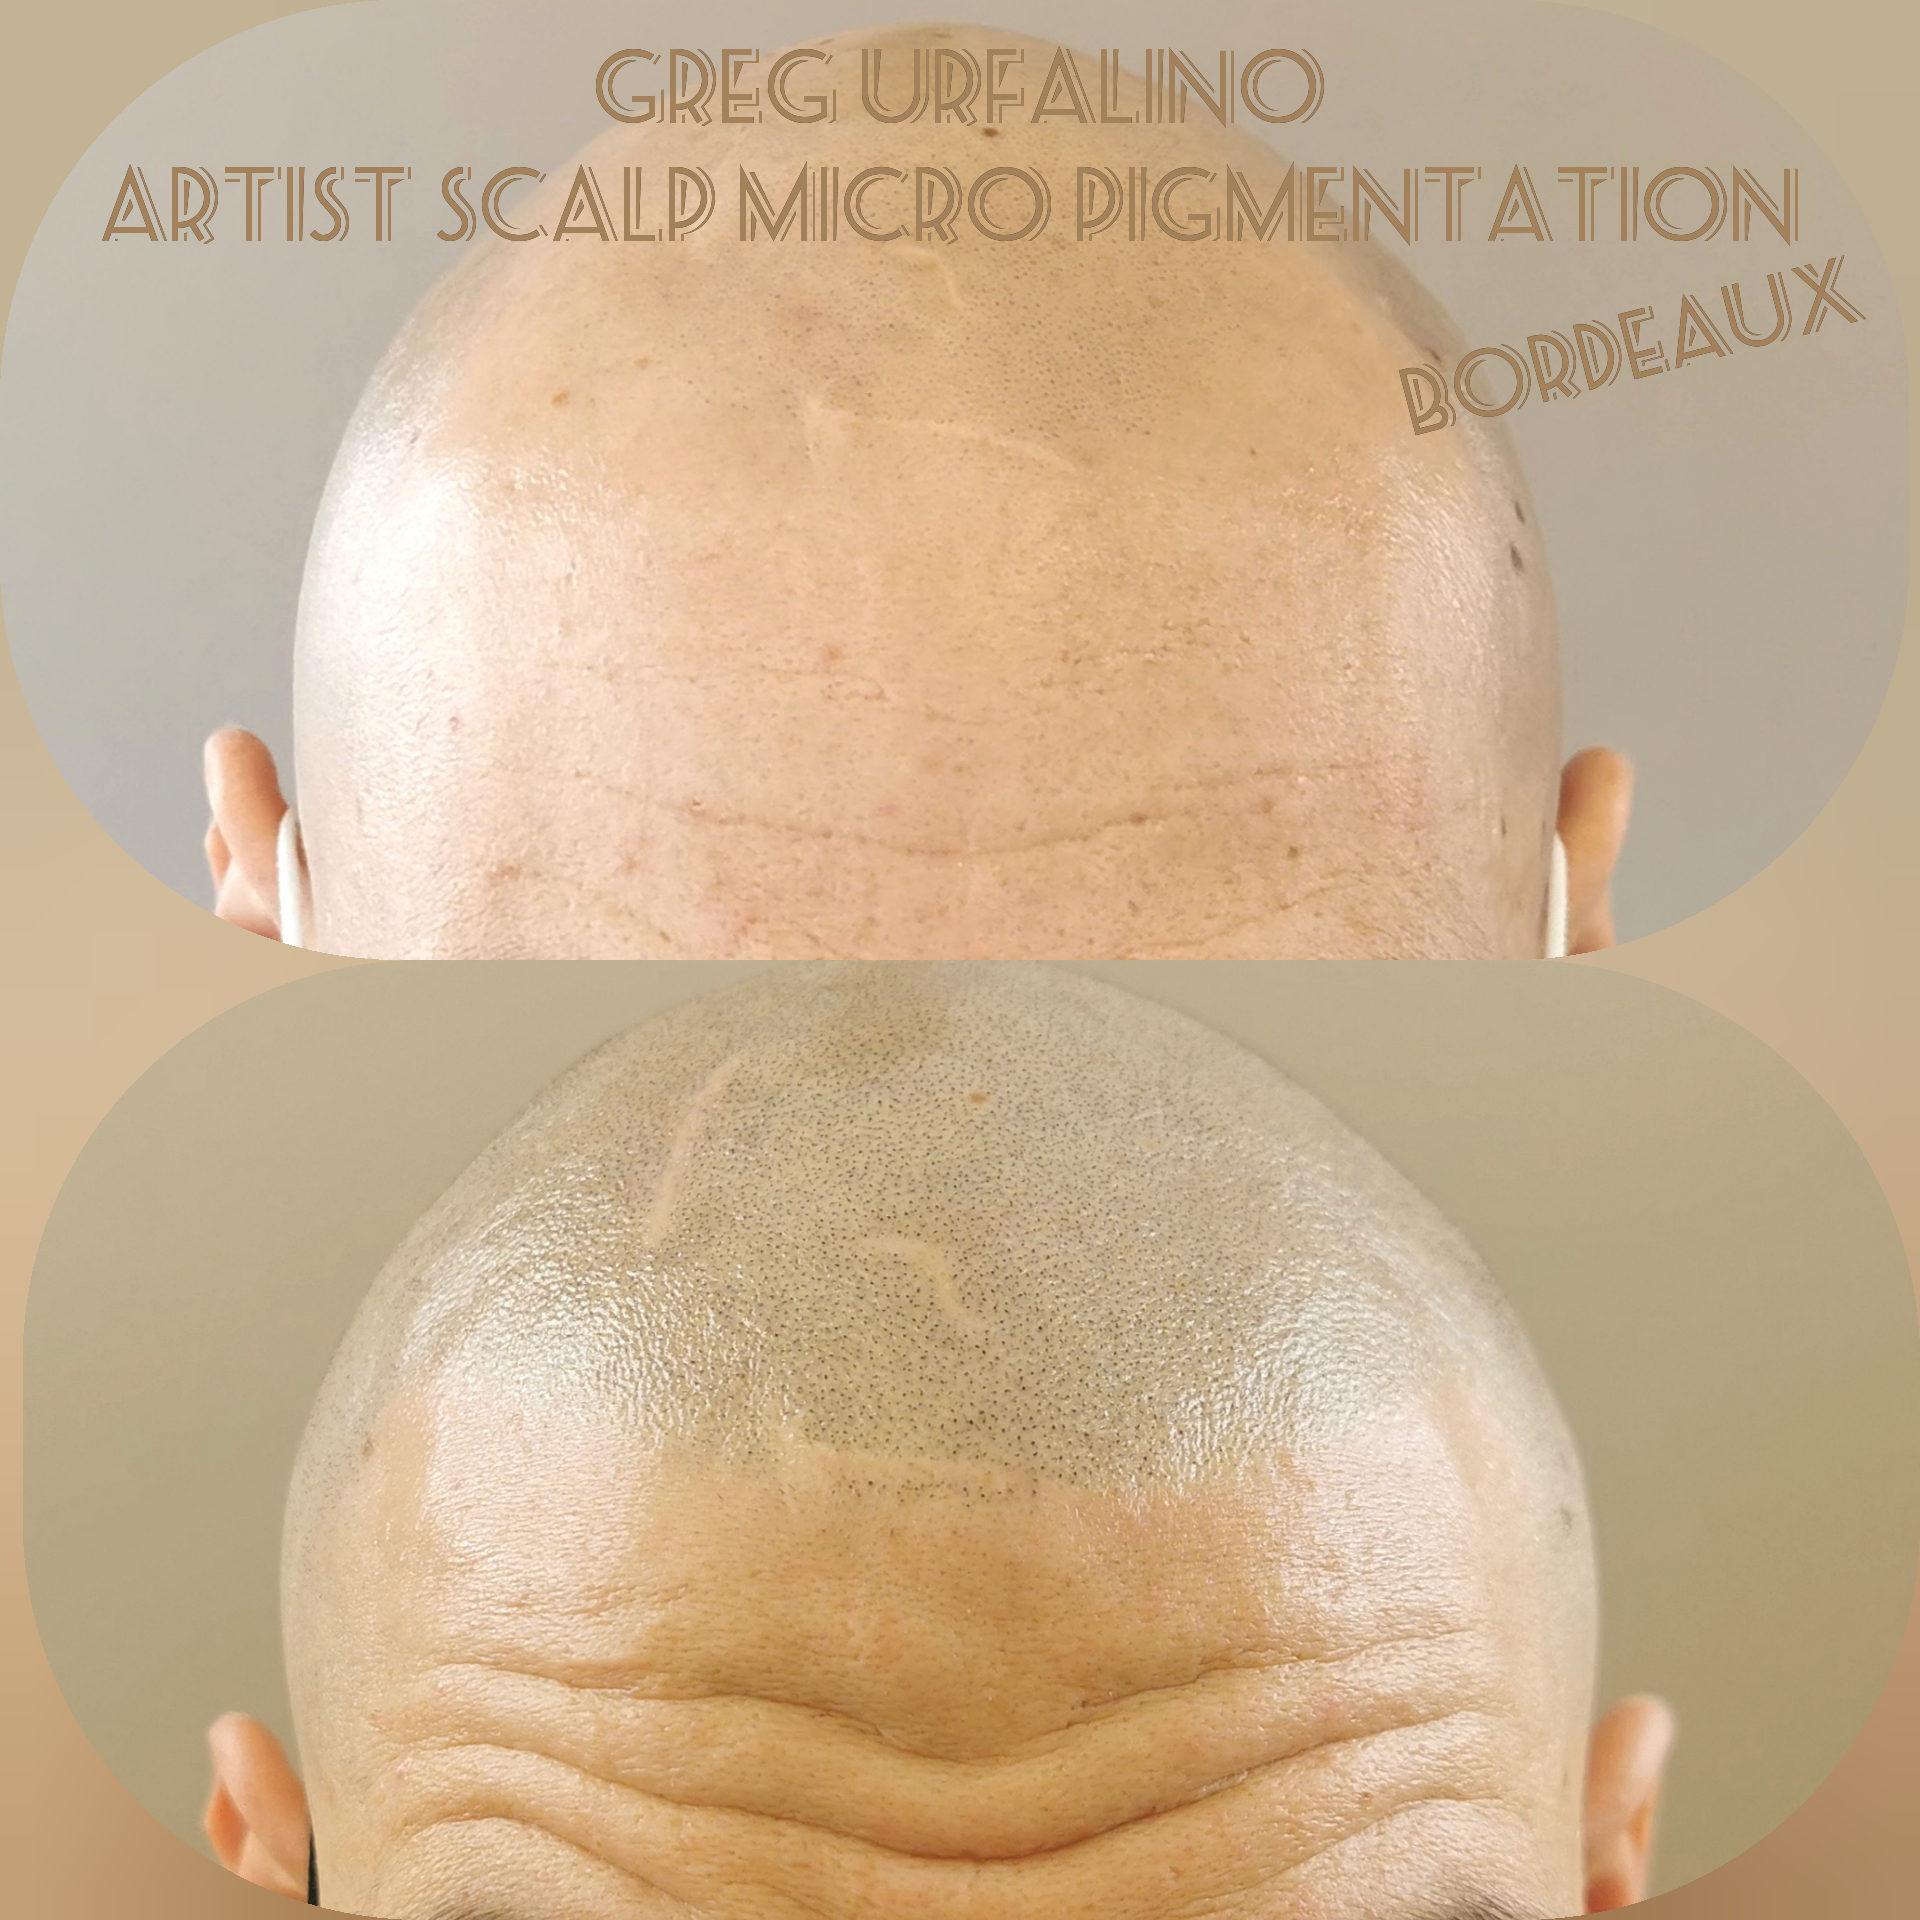 Greg Urfalino artist smp bordeaux #tricopigmentation #tricopigmentationbordeaux #smpbordeaux #tricopigmentation #artisttatoo #bordeaux